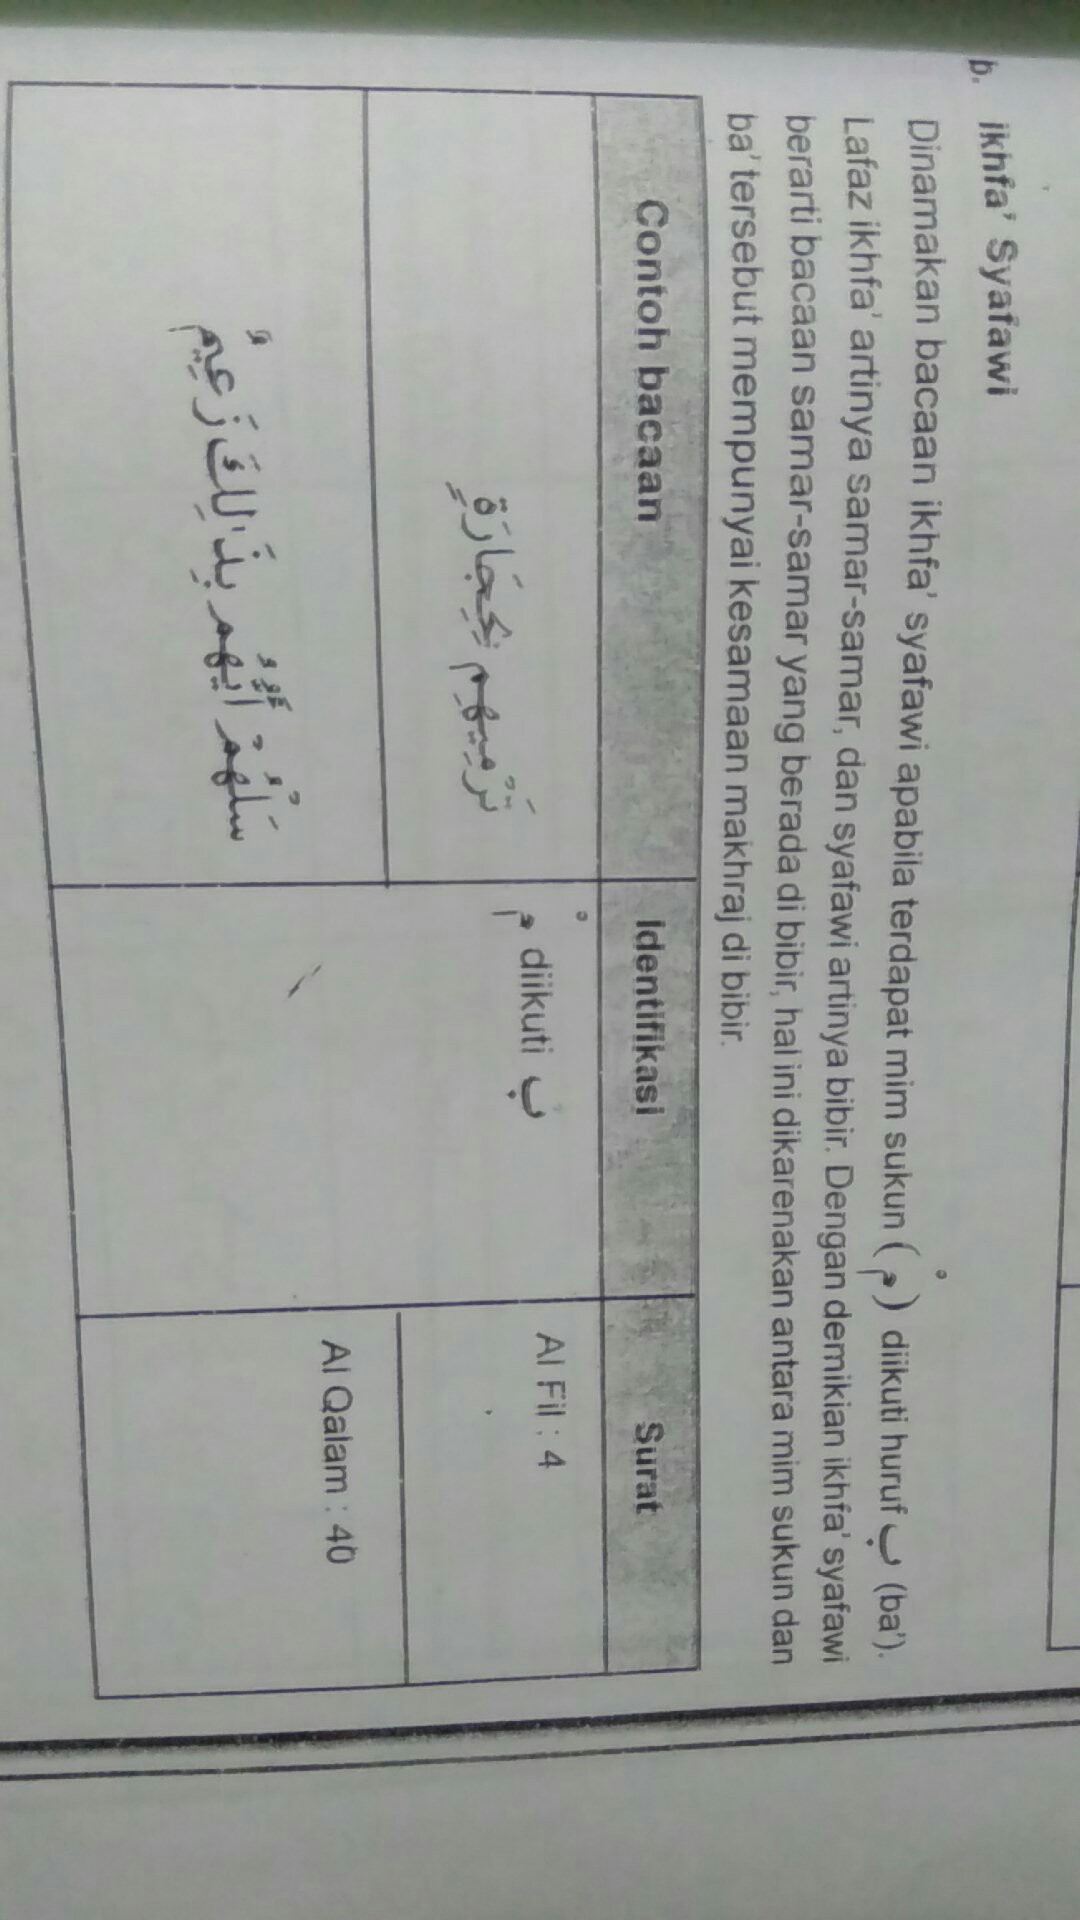 Contoh Ikhfa Syafawi Di Al Quran : contoh, ikhfa, syafawi, quran, Ikhfa, Syafawi, Contohnya, Dalam, Al-quran, Brainly.co.id